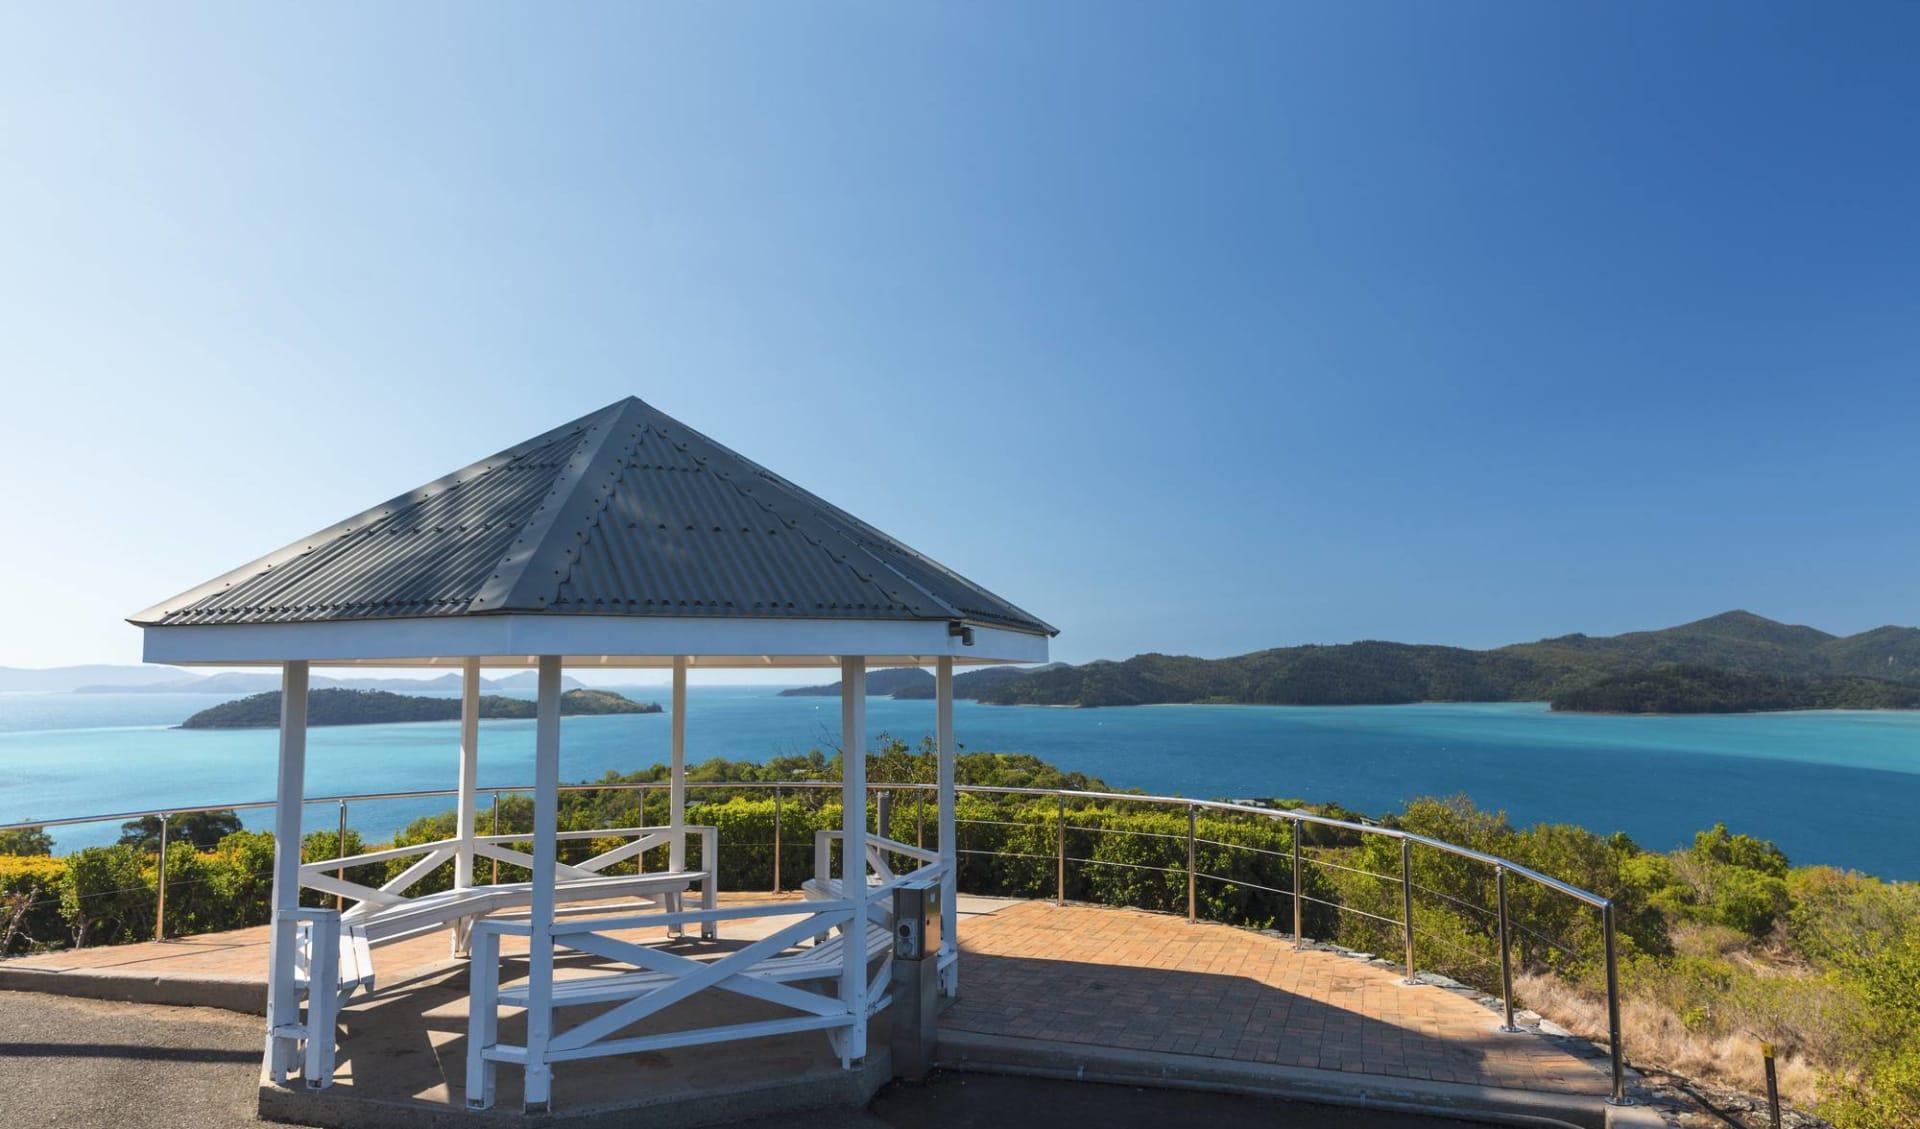 Reef View Hotel in Hamilton Island: Natur Hamilton Island Queensland Australien  Blick auf den Lookout  c shutterstock_238661716 2017